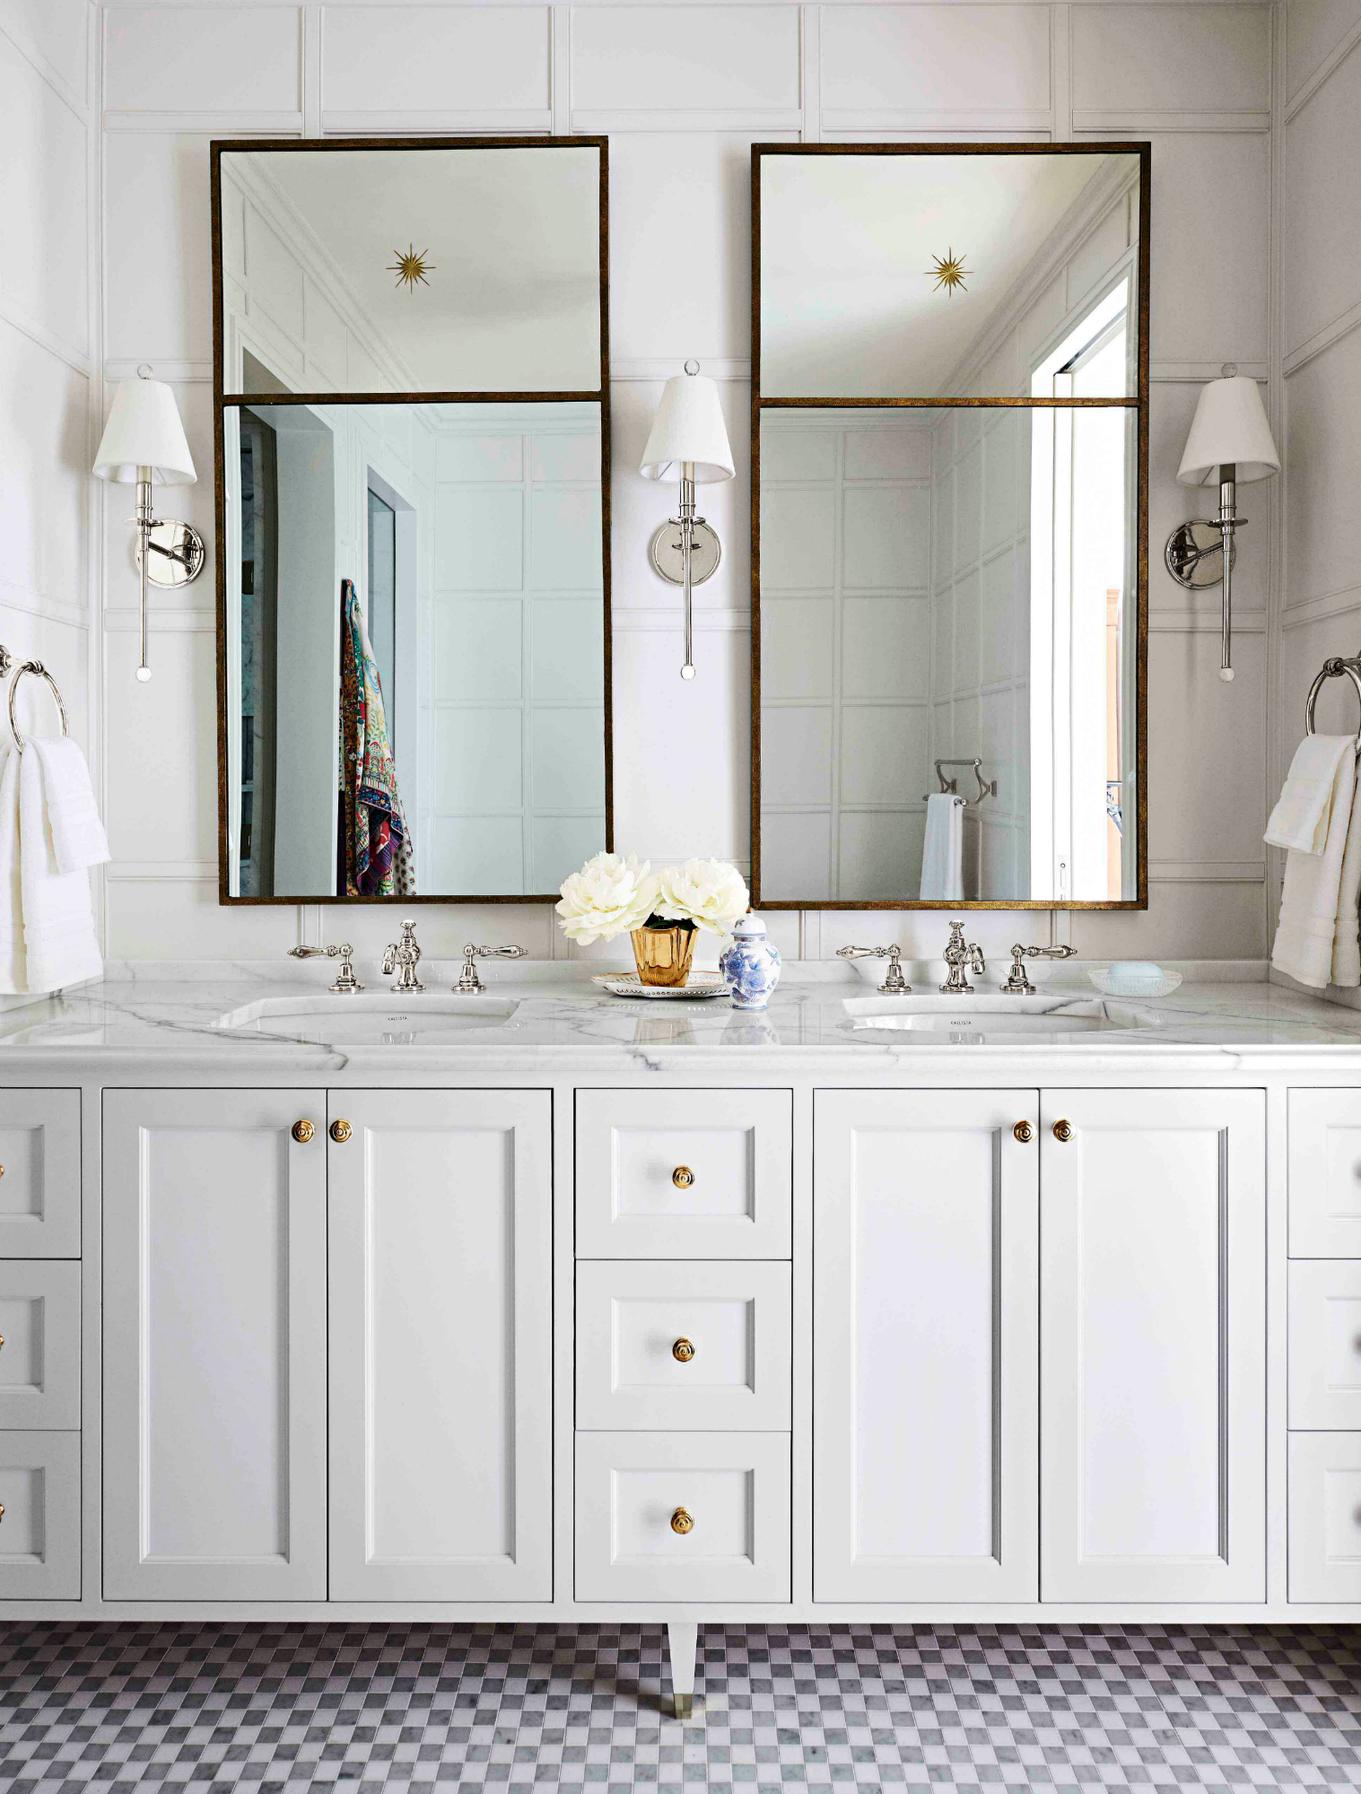 60 Best Bathroom Designs Photos Of Beautiful Bathroom Ideas To Try Bathroom Layout Small Bathroom Solutions Small Bathroom